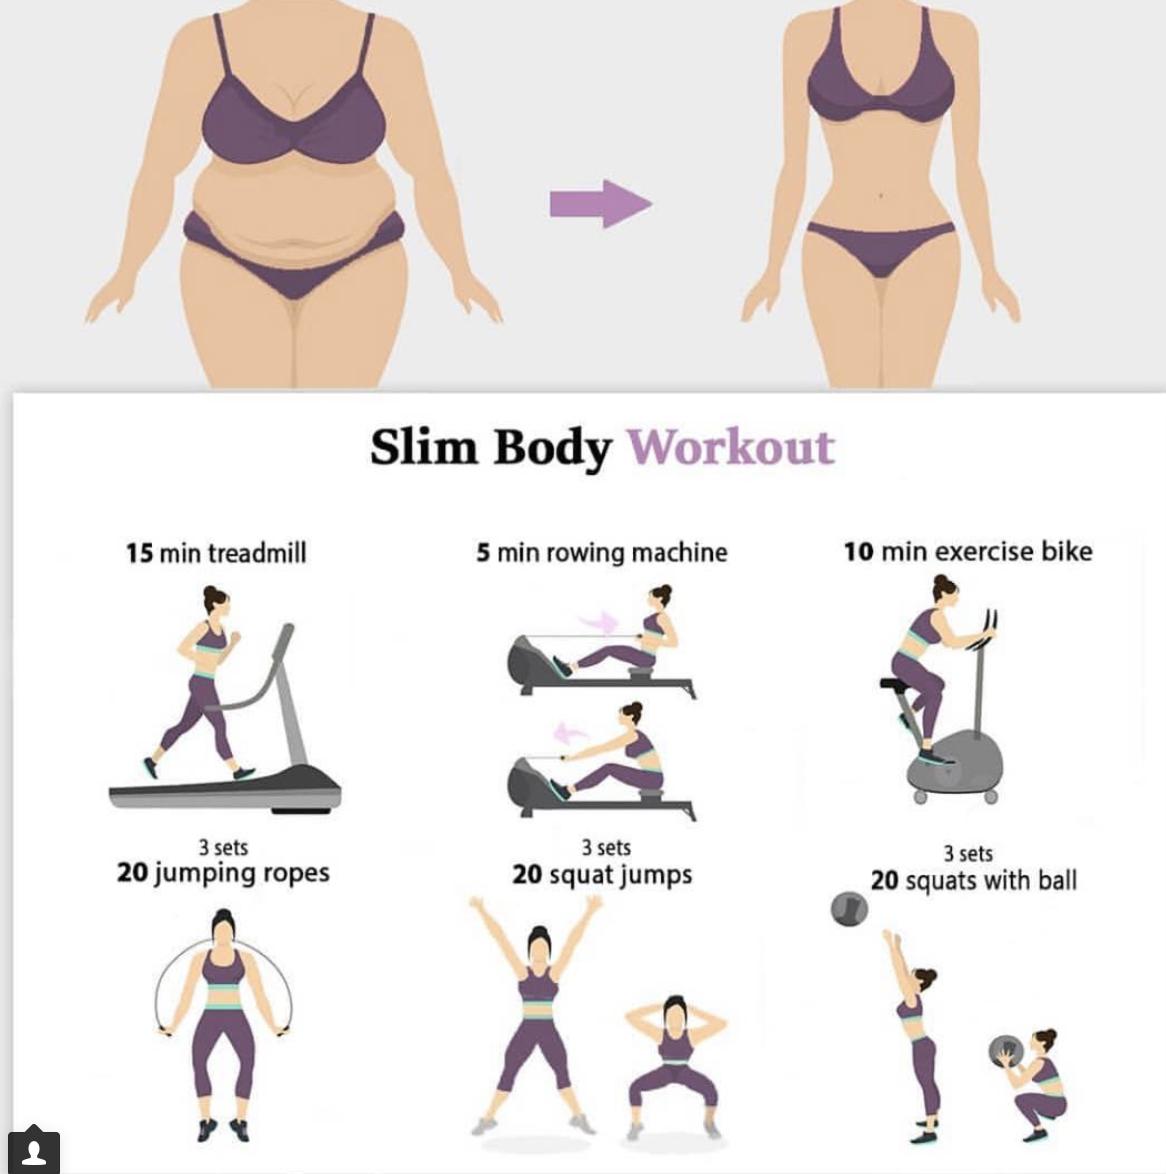 10 steps to slim figure